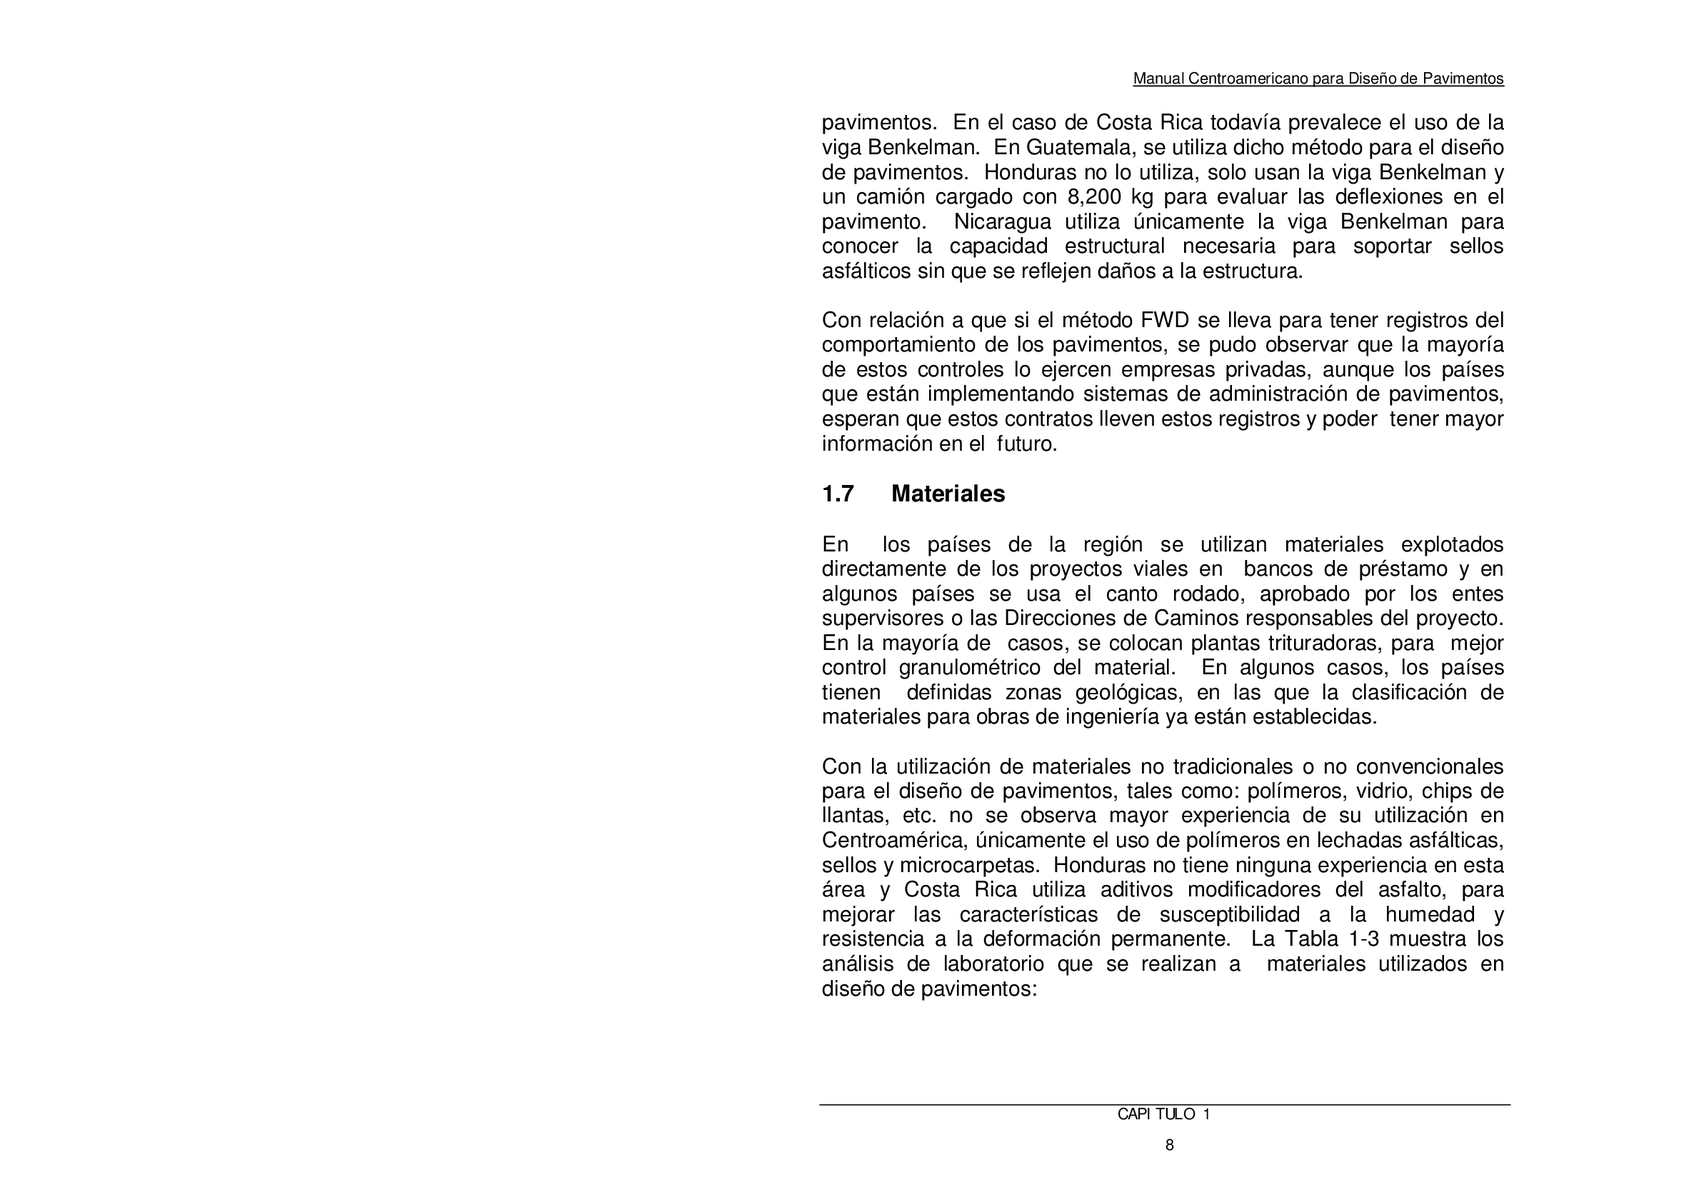 Manual de Pavimentos - CALAMEO Downloader